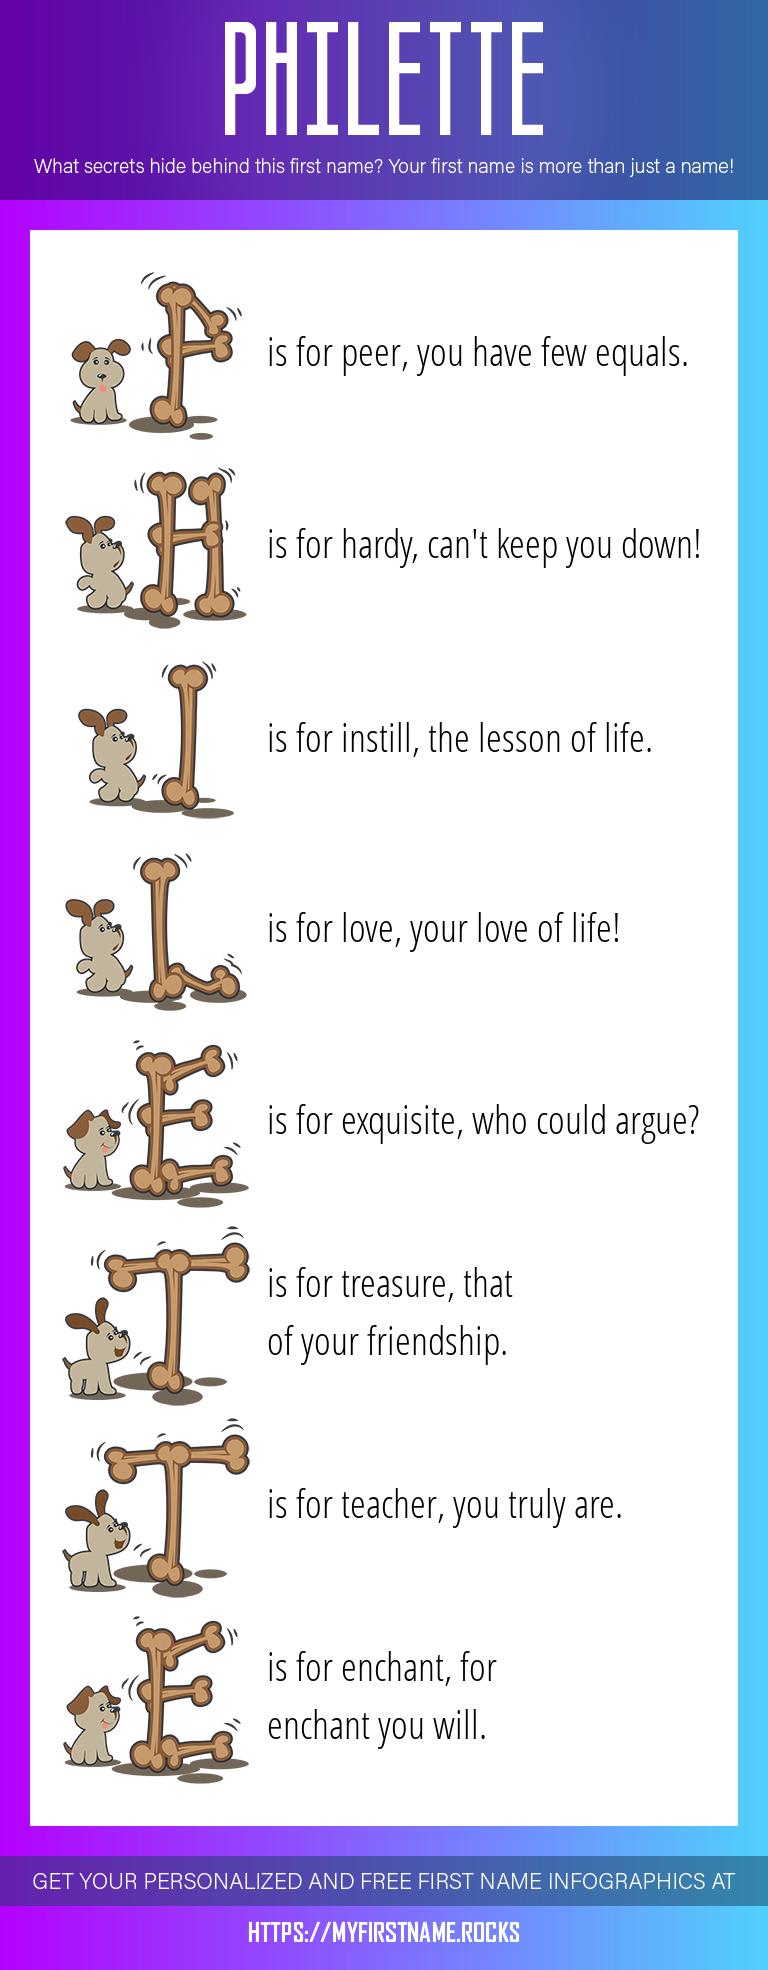 Philette Infographics